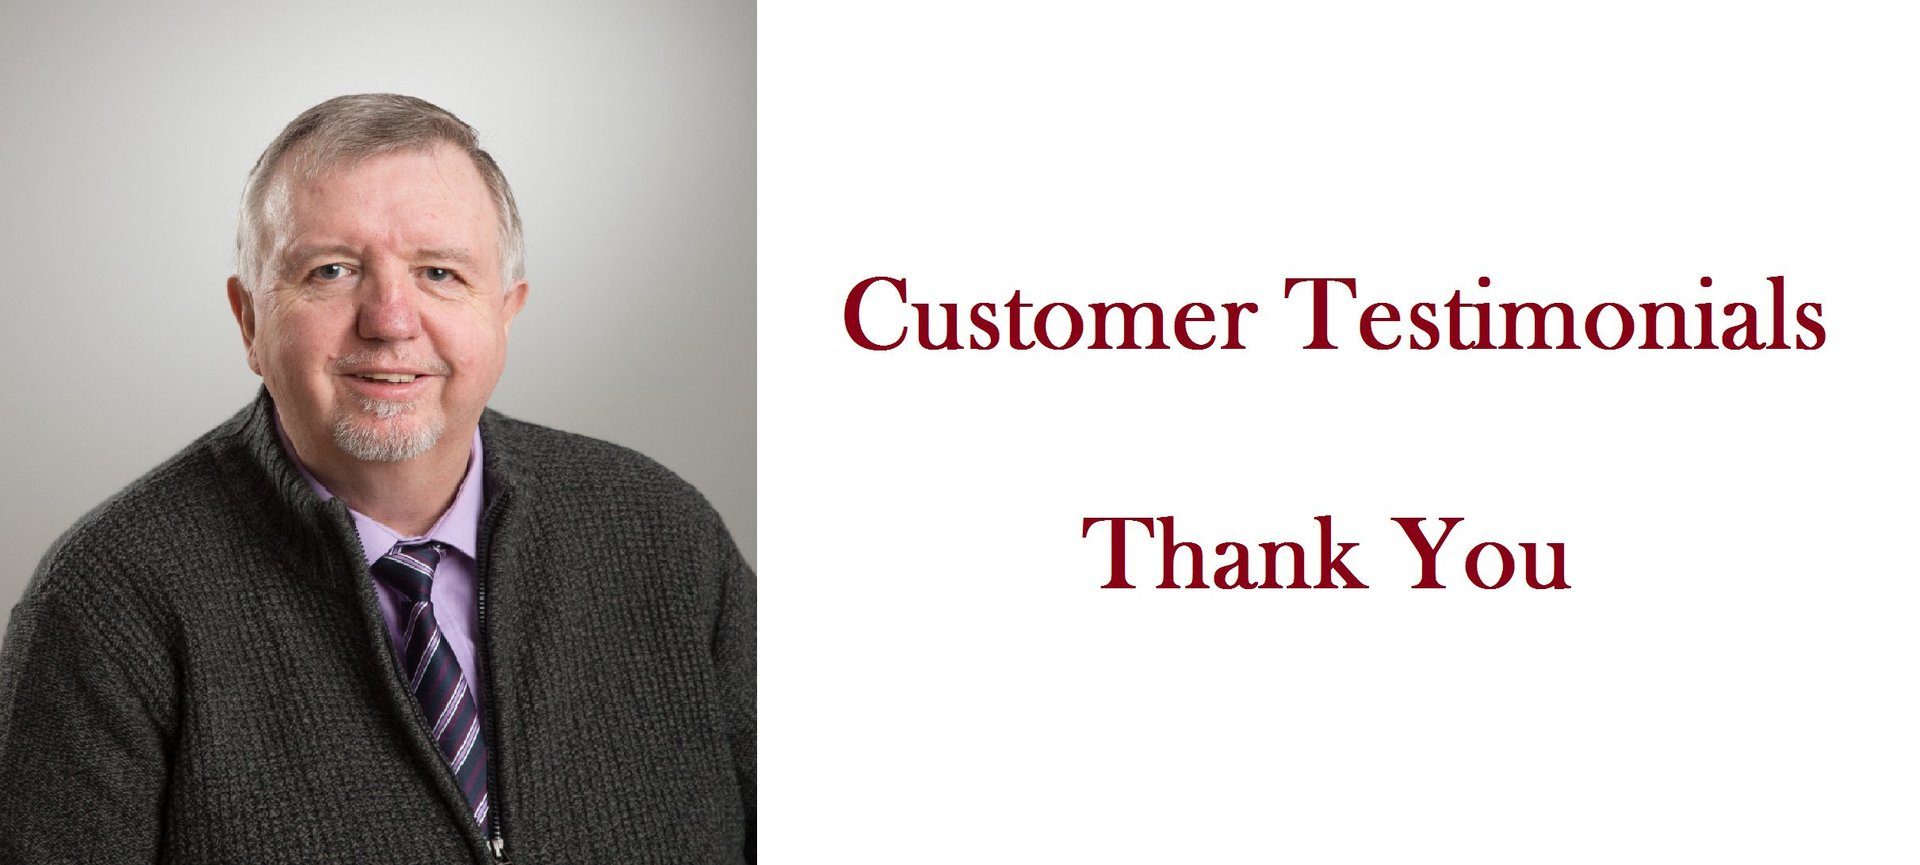 Ian Hextall Customer Testimonial comment @uk genealogy com